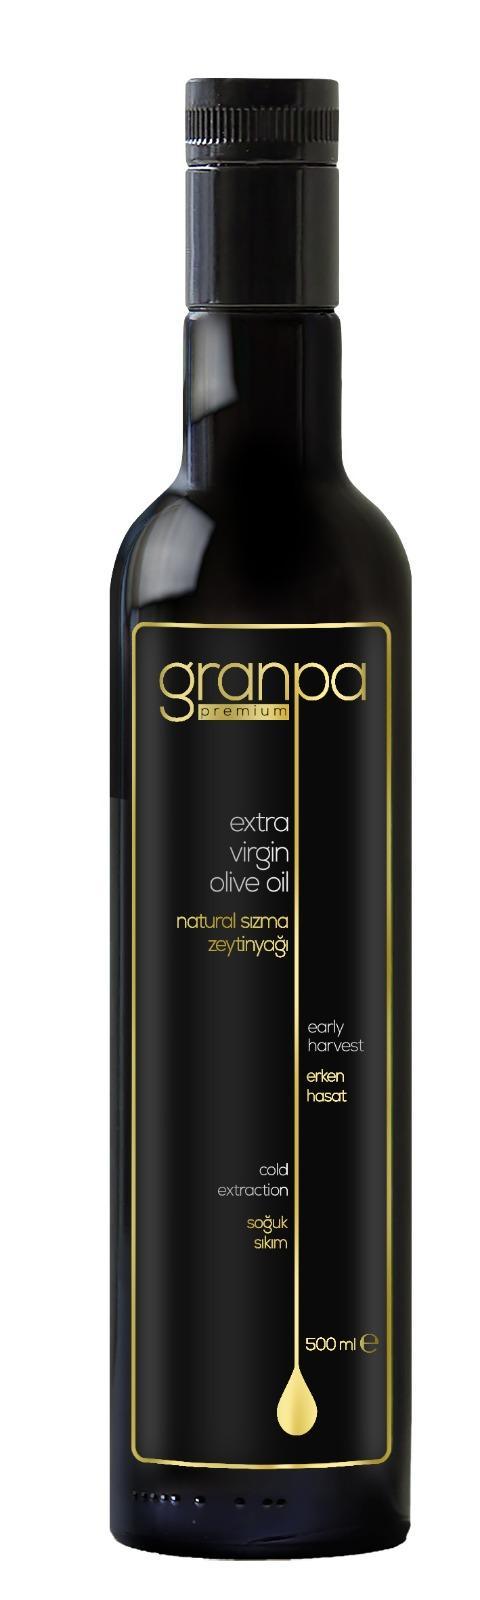 Granpa Premium 500ml